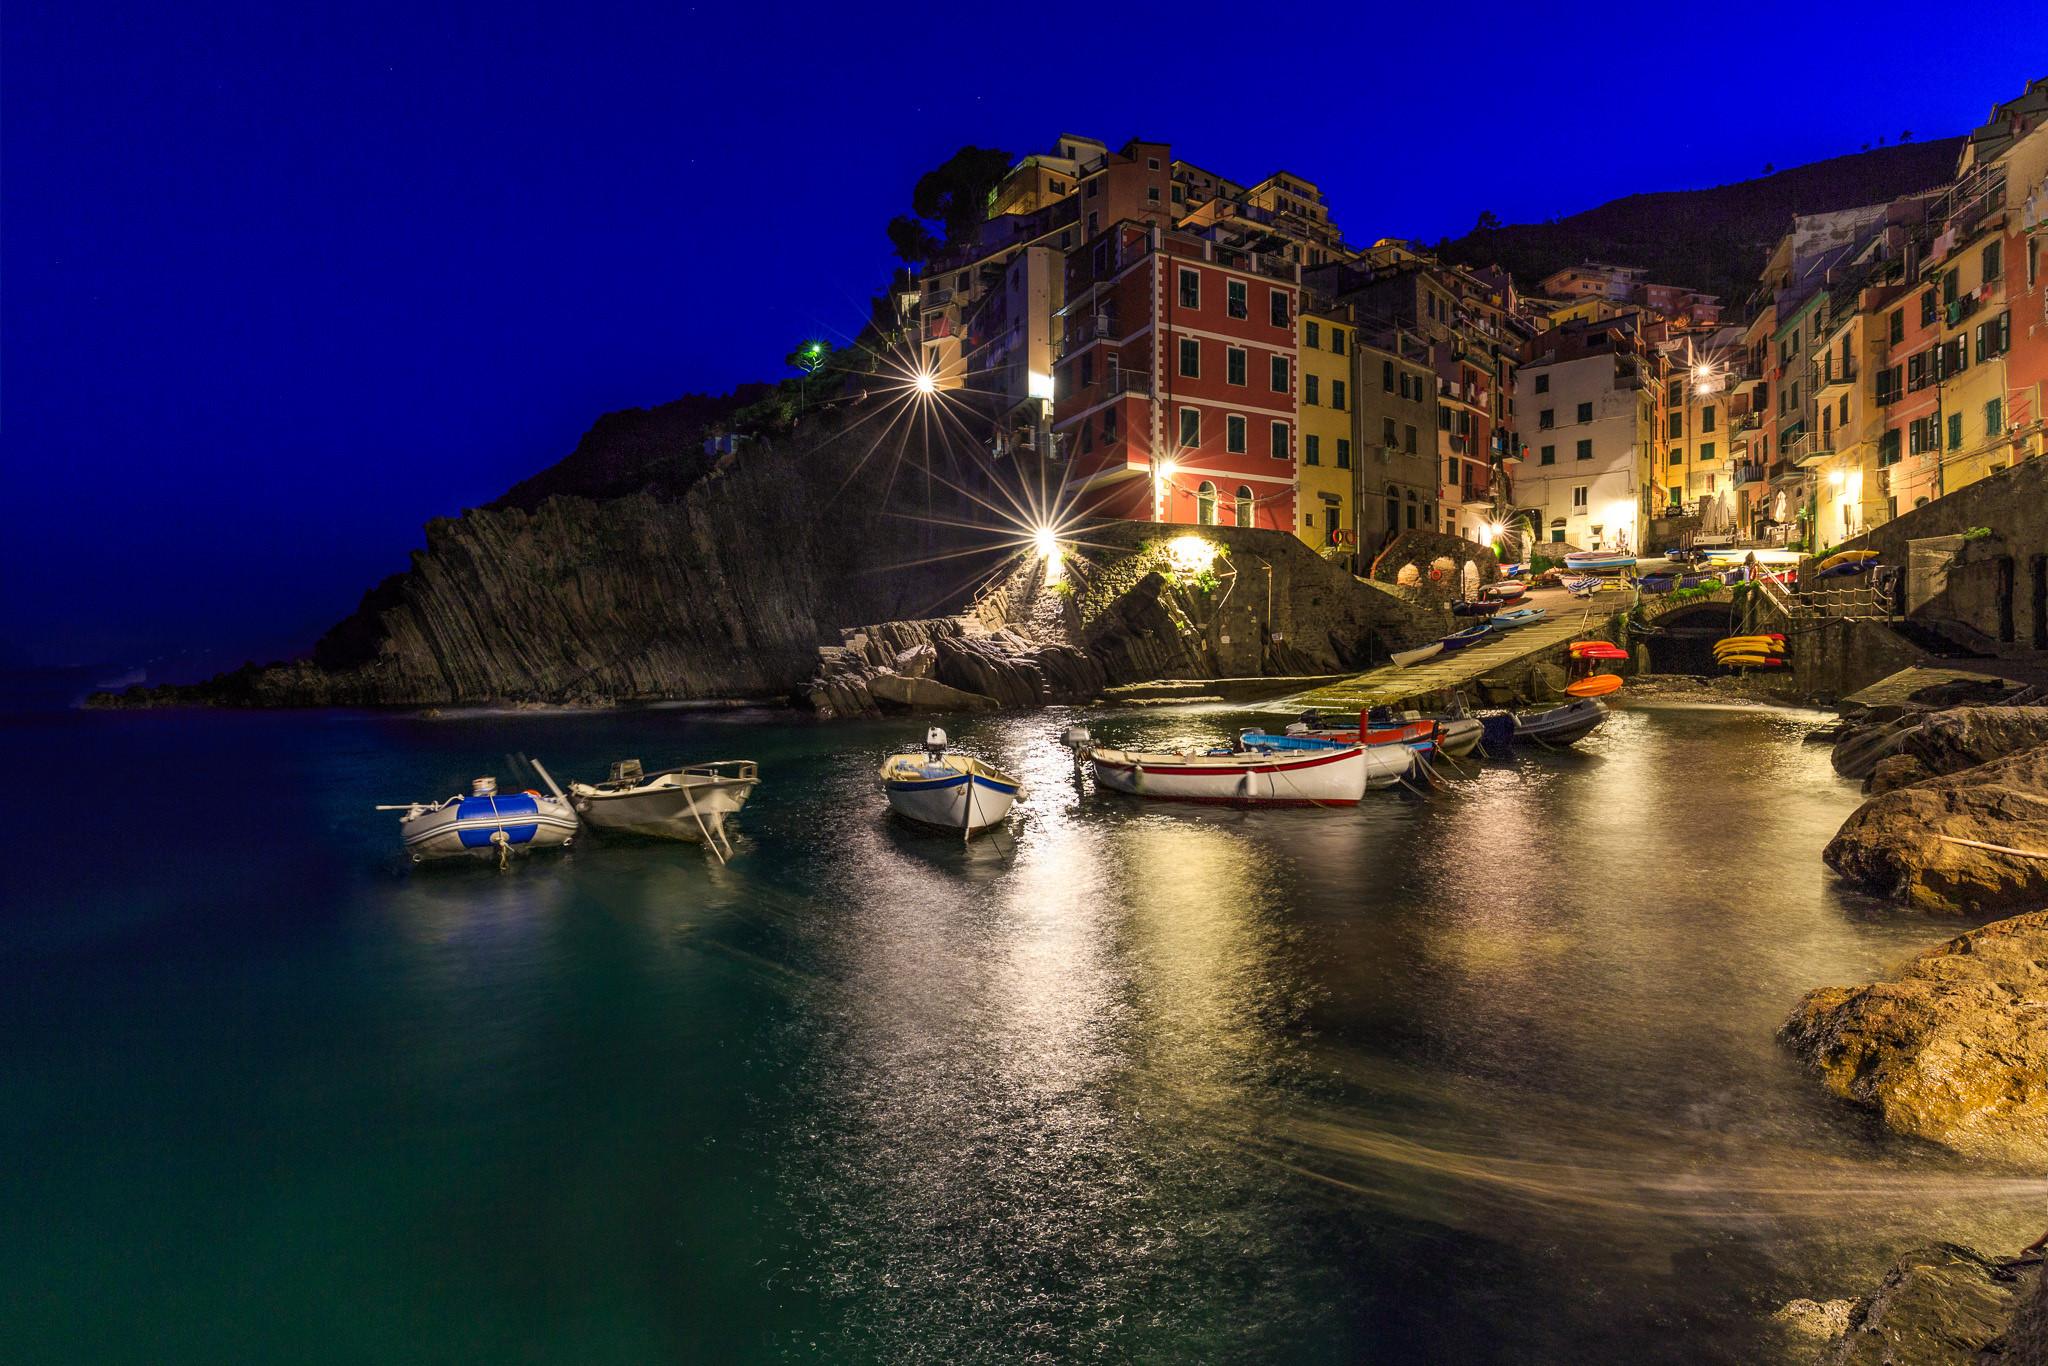 обои Риомаджоре, Италия, ночь картинки фото